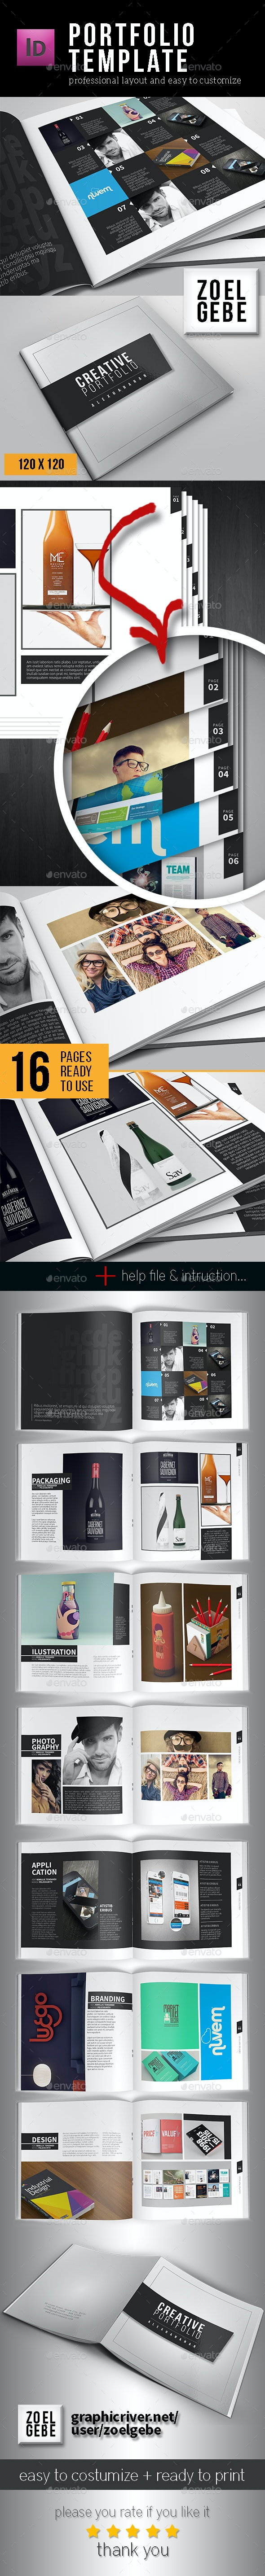 Portfolio Template - Square - Brochures Print Templates